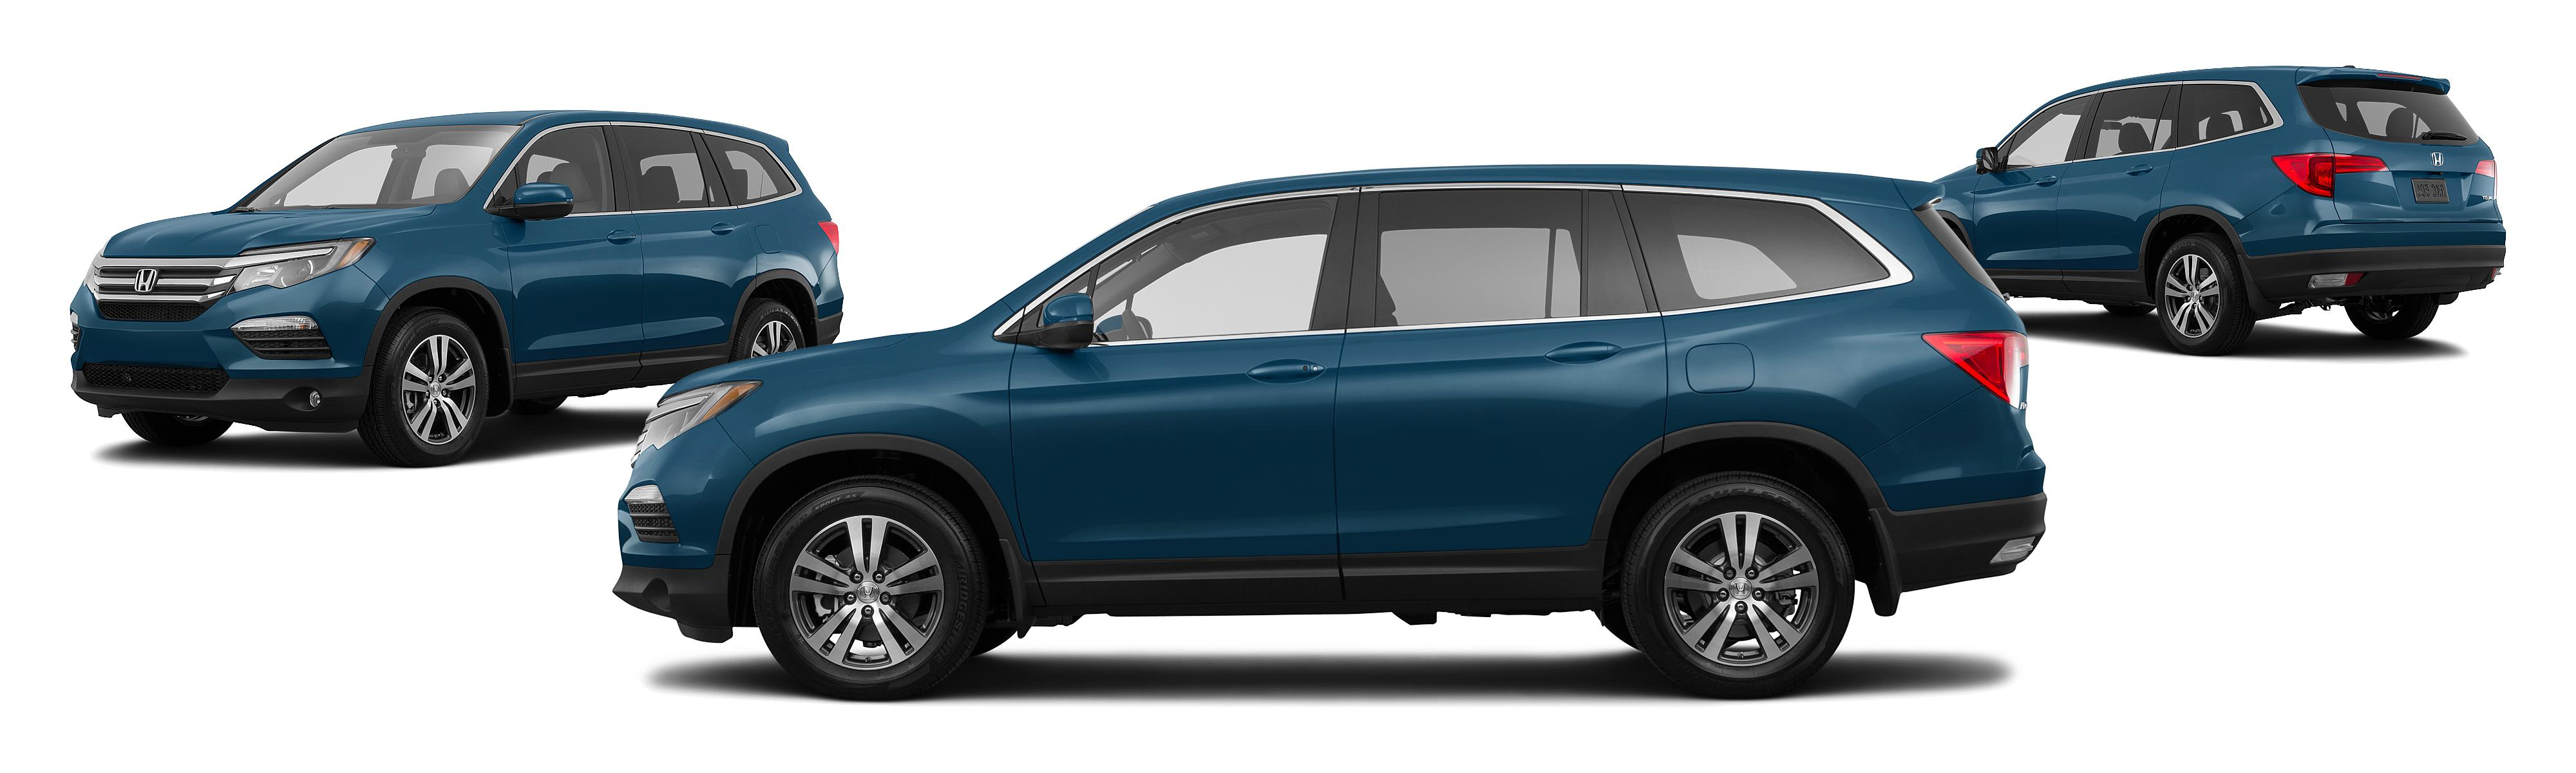 Honda Pilot EXL Dr SUV Research GrooveCar - 2017 honda pilot ex l invoice price